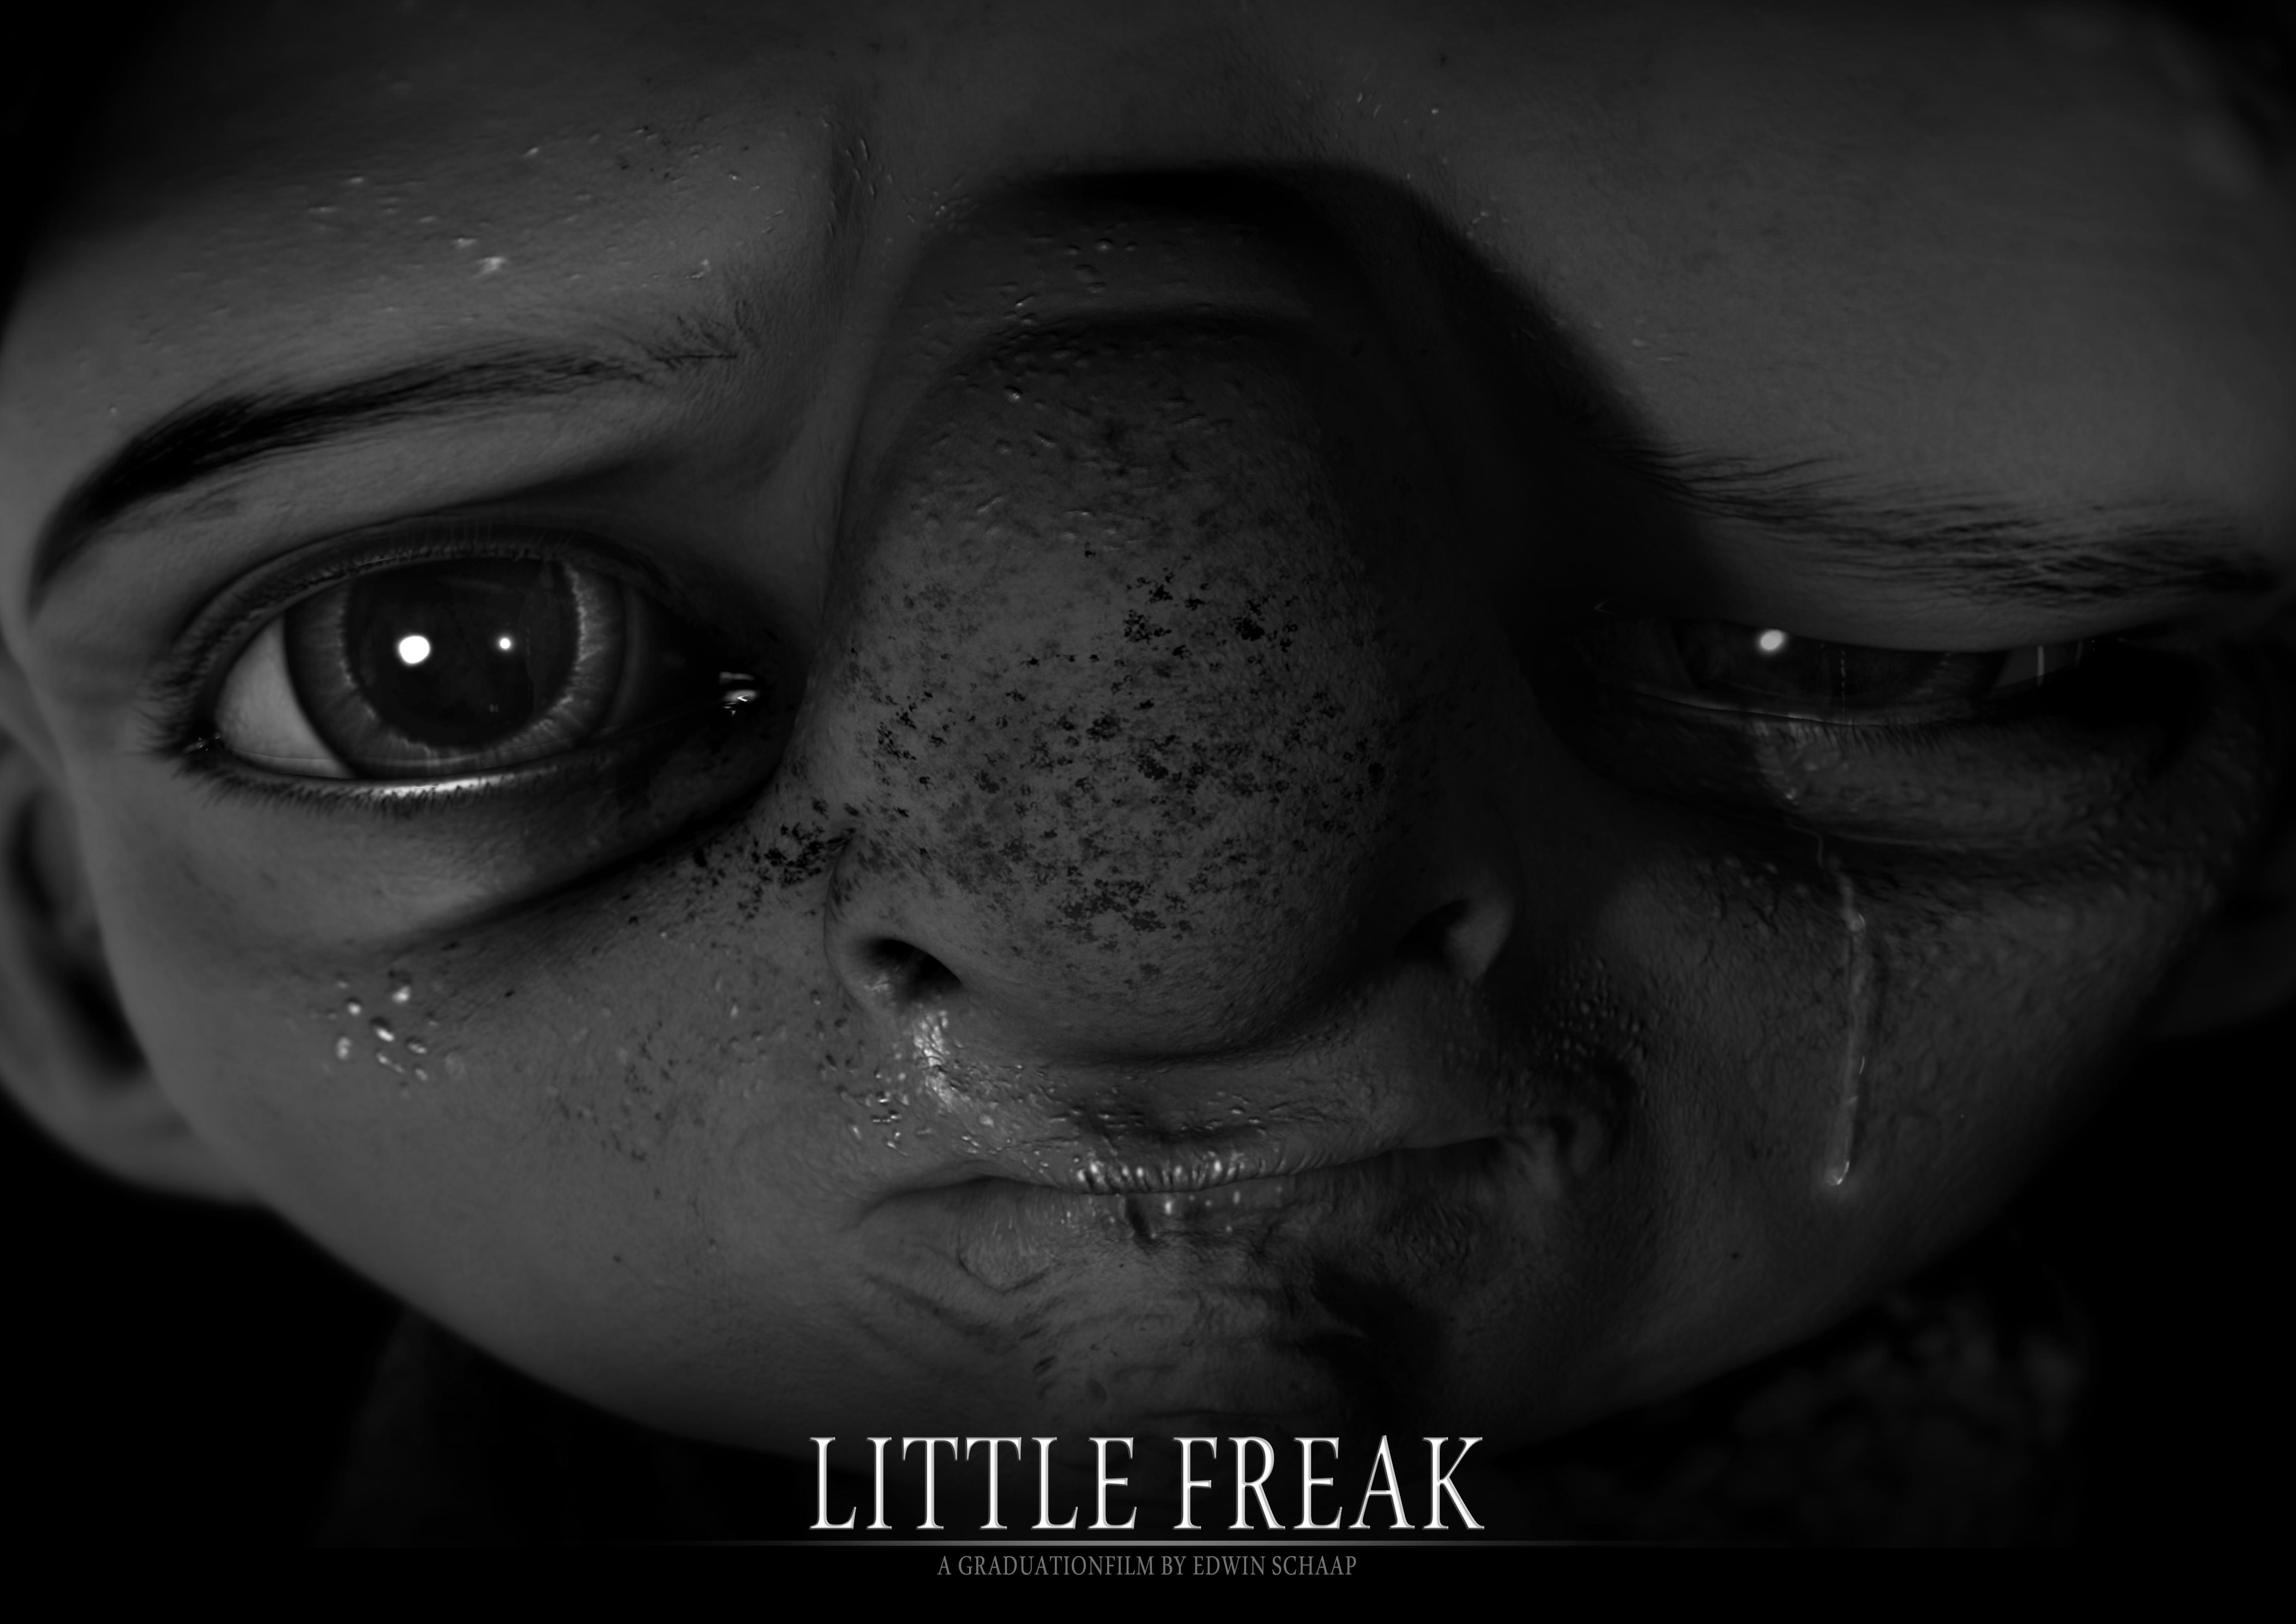 دانلود زیرنویس فارسی فیلم Little Freak